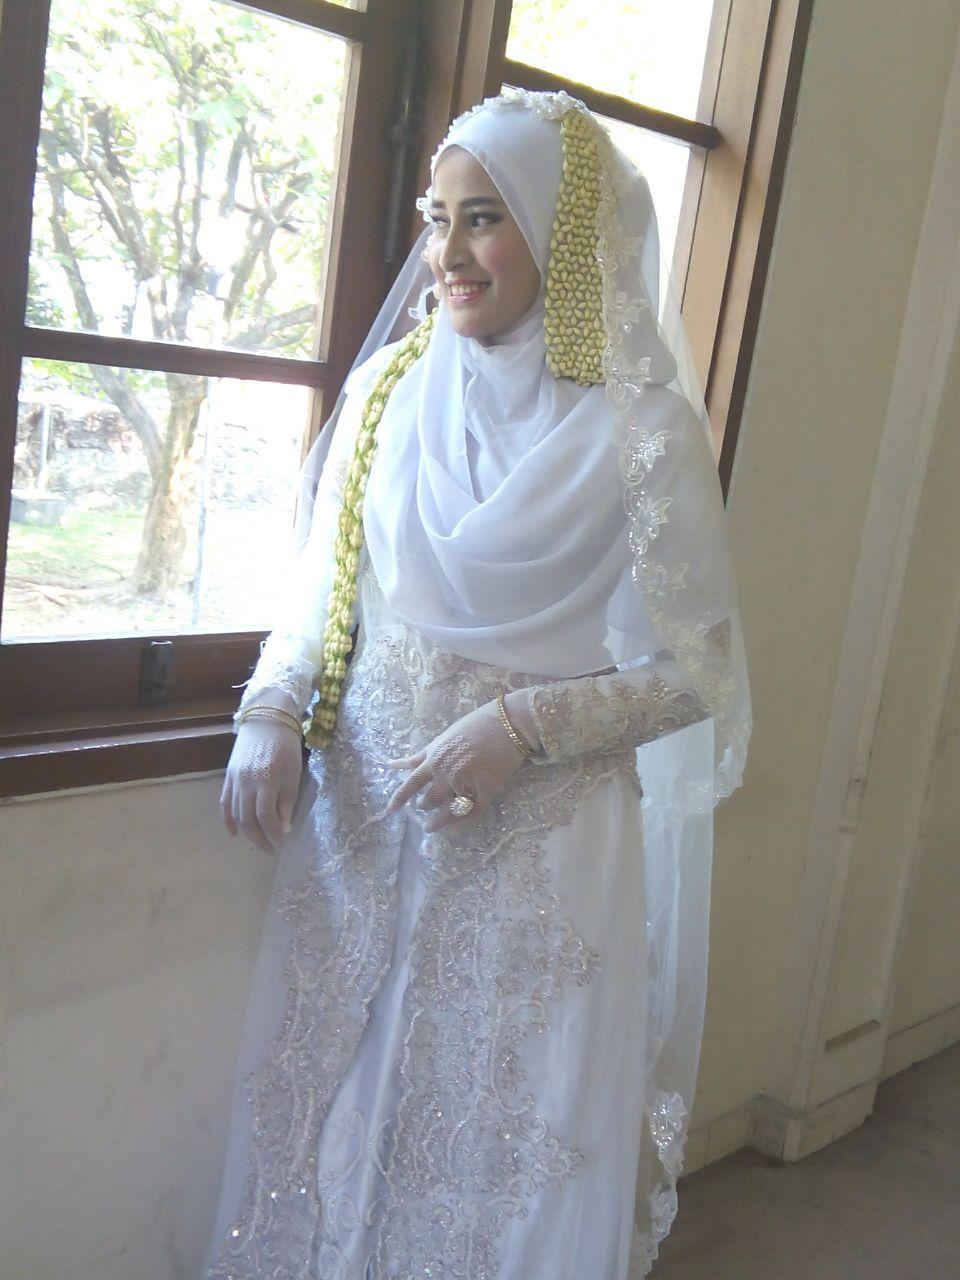 Sewa Gaun Pengantin Bandung  9: Sewa Gaun Pengantin